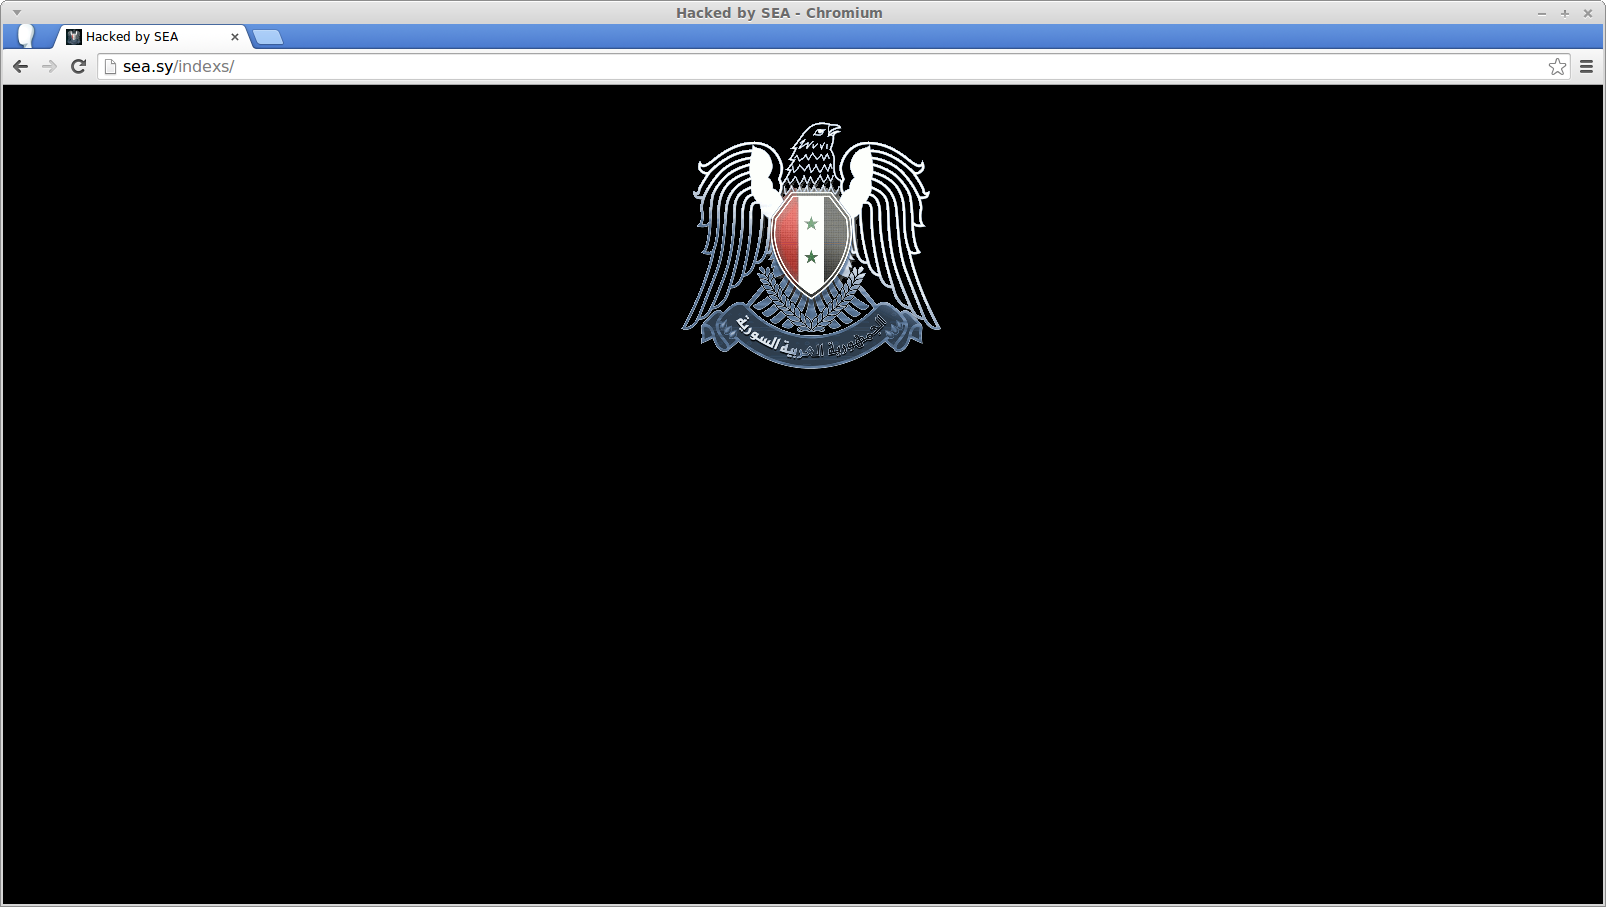 Screenshot-Hacked by SEA - Chromium